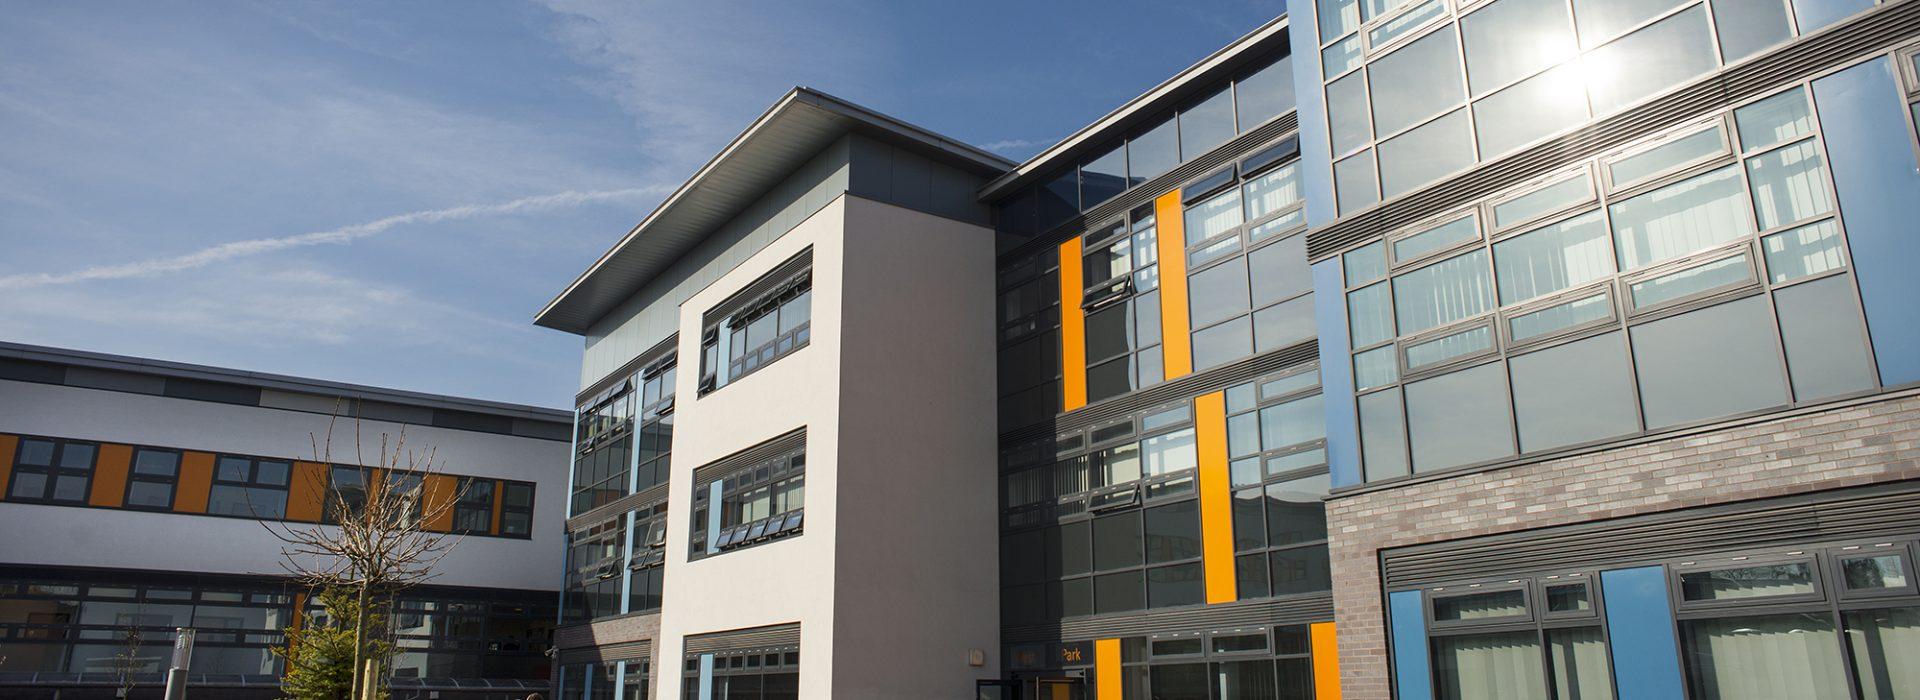 Carmel College building